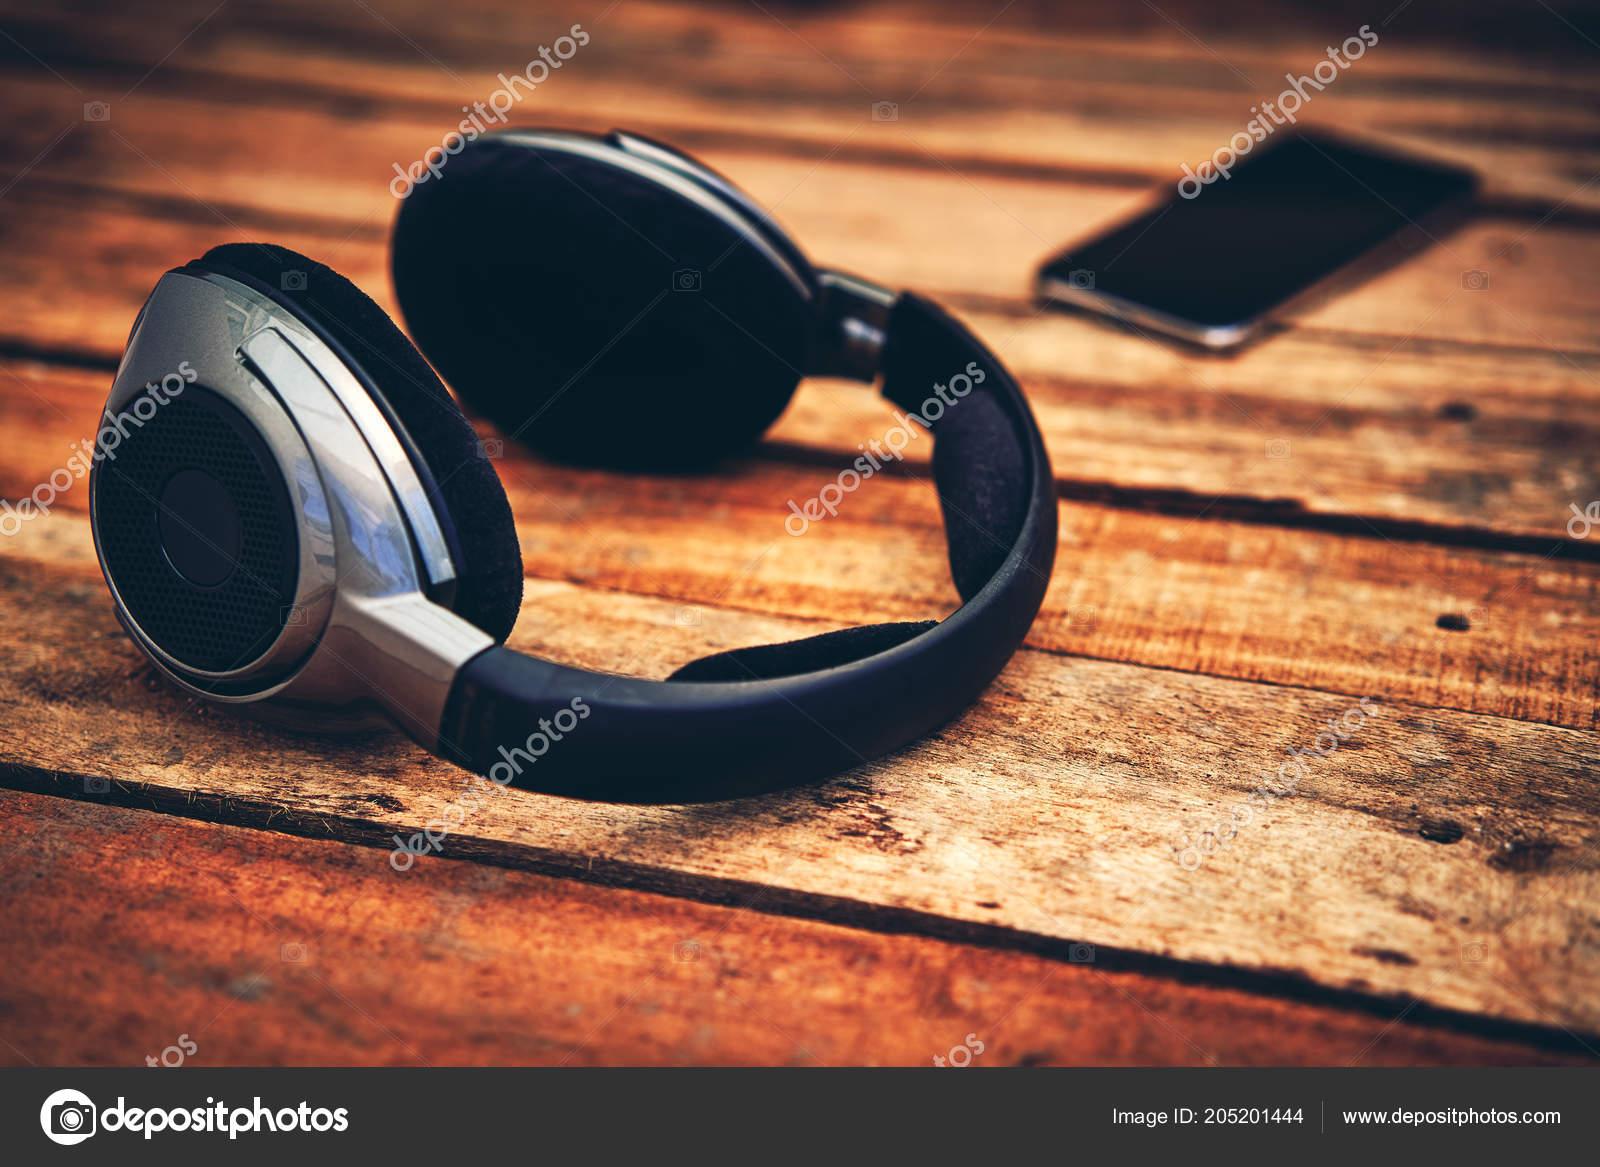 Degree View Set Wireless Headphones Mobile Phone Lying Rustic Wooden Stock Photo C Izelphotography 205201444